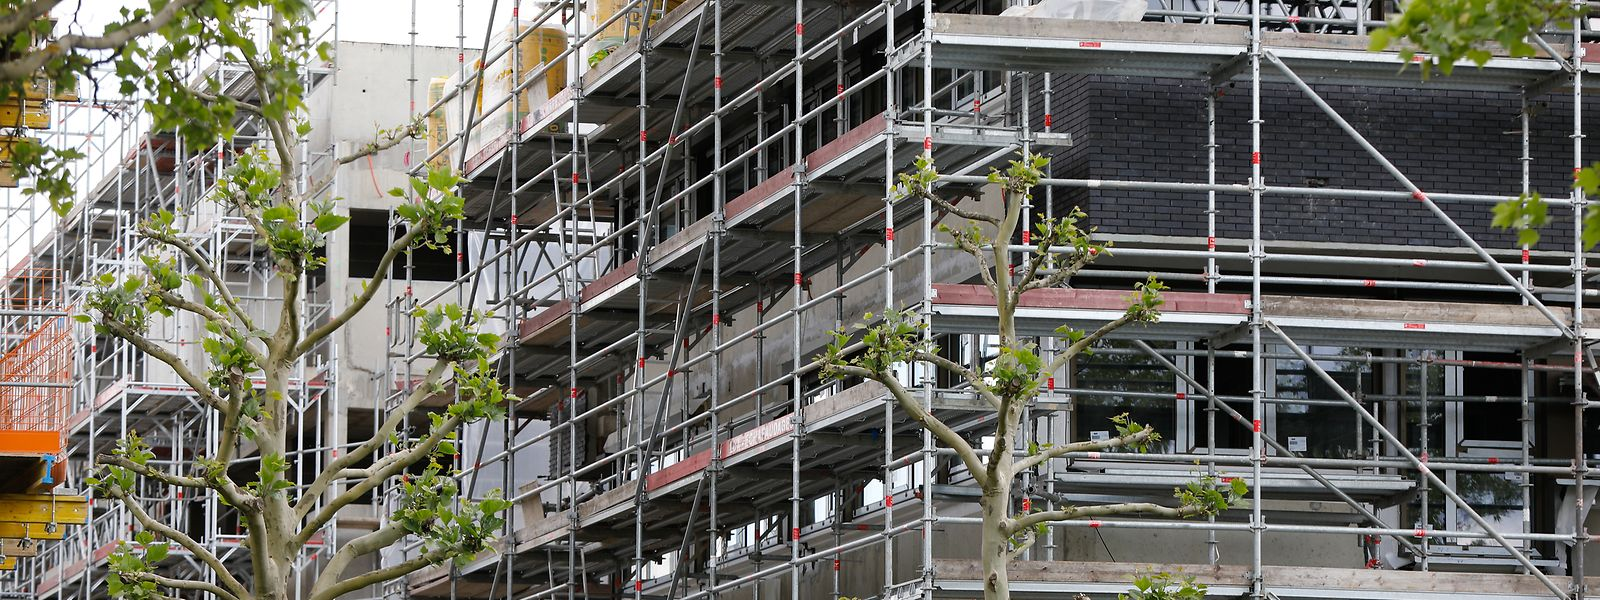 Neben dem Staat und den Gemeinden können auch der Fonds du logement und die Société nationale des habitations à bon marché (SNHBM) das Droit de préemption ausüben.